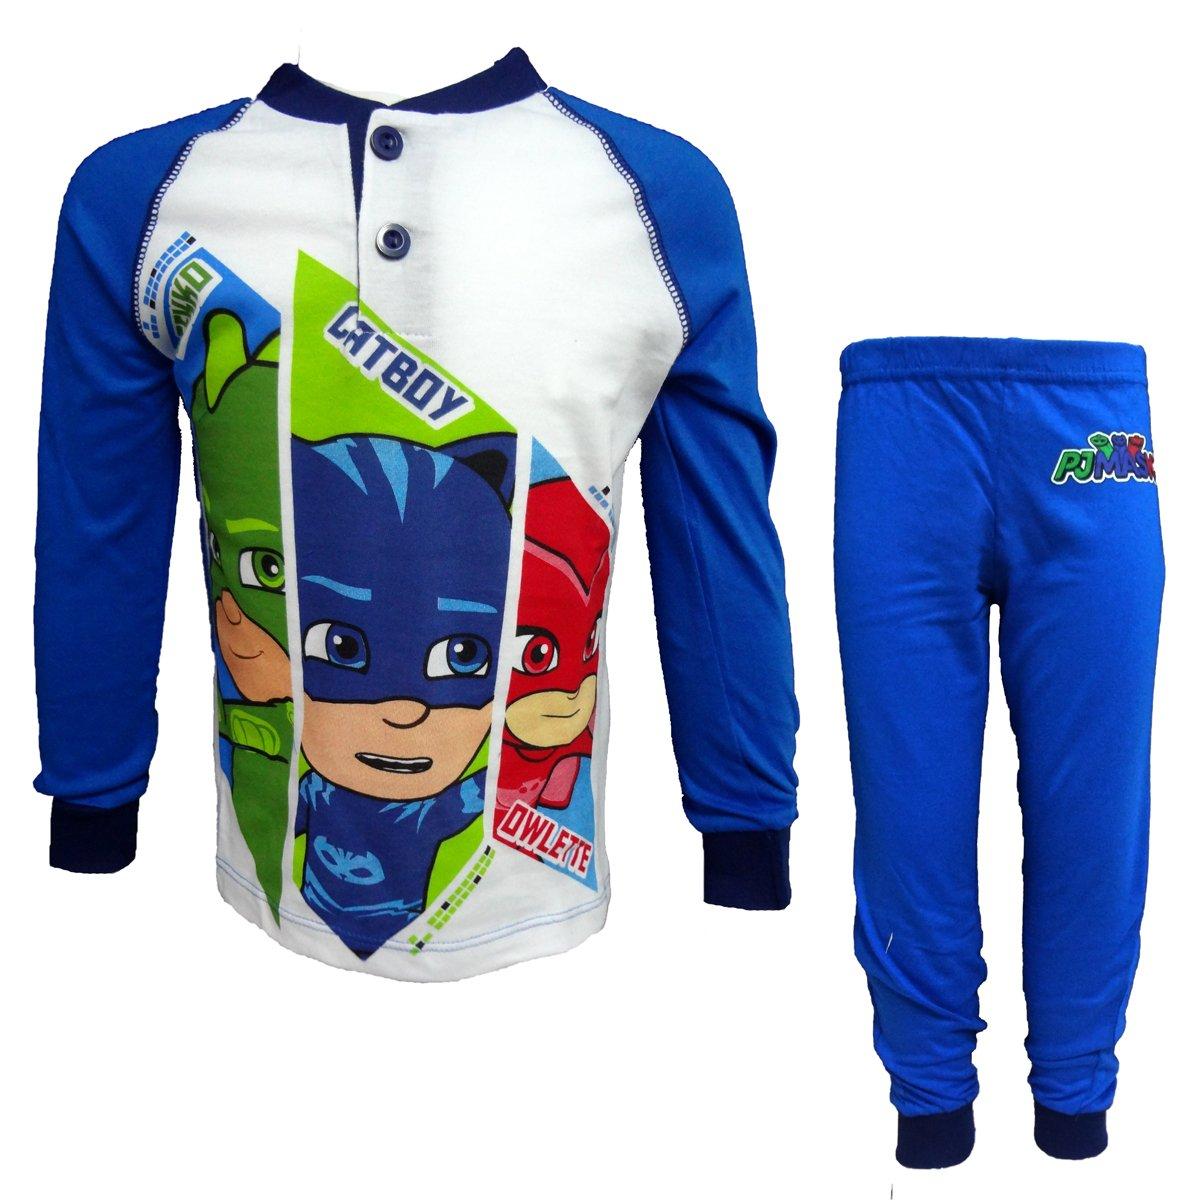 pigiama bimbo lungo in cotone jersey PJMASKS art. PL16037 (royal, 4 anni)